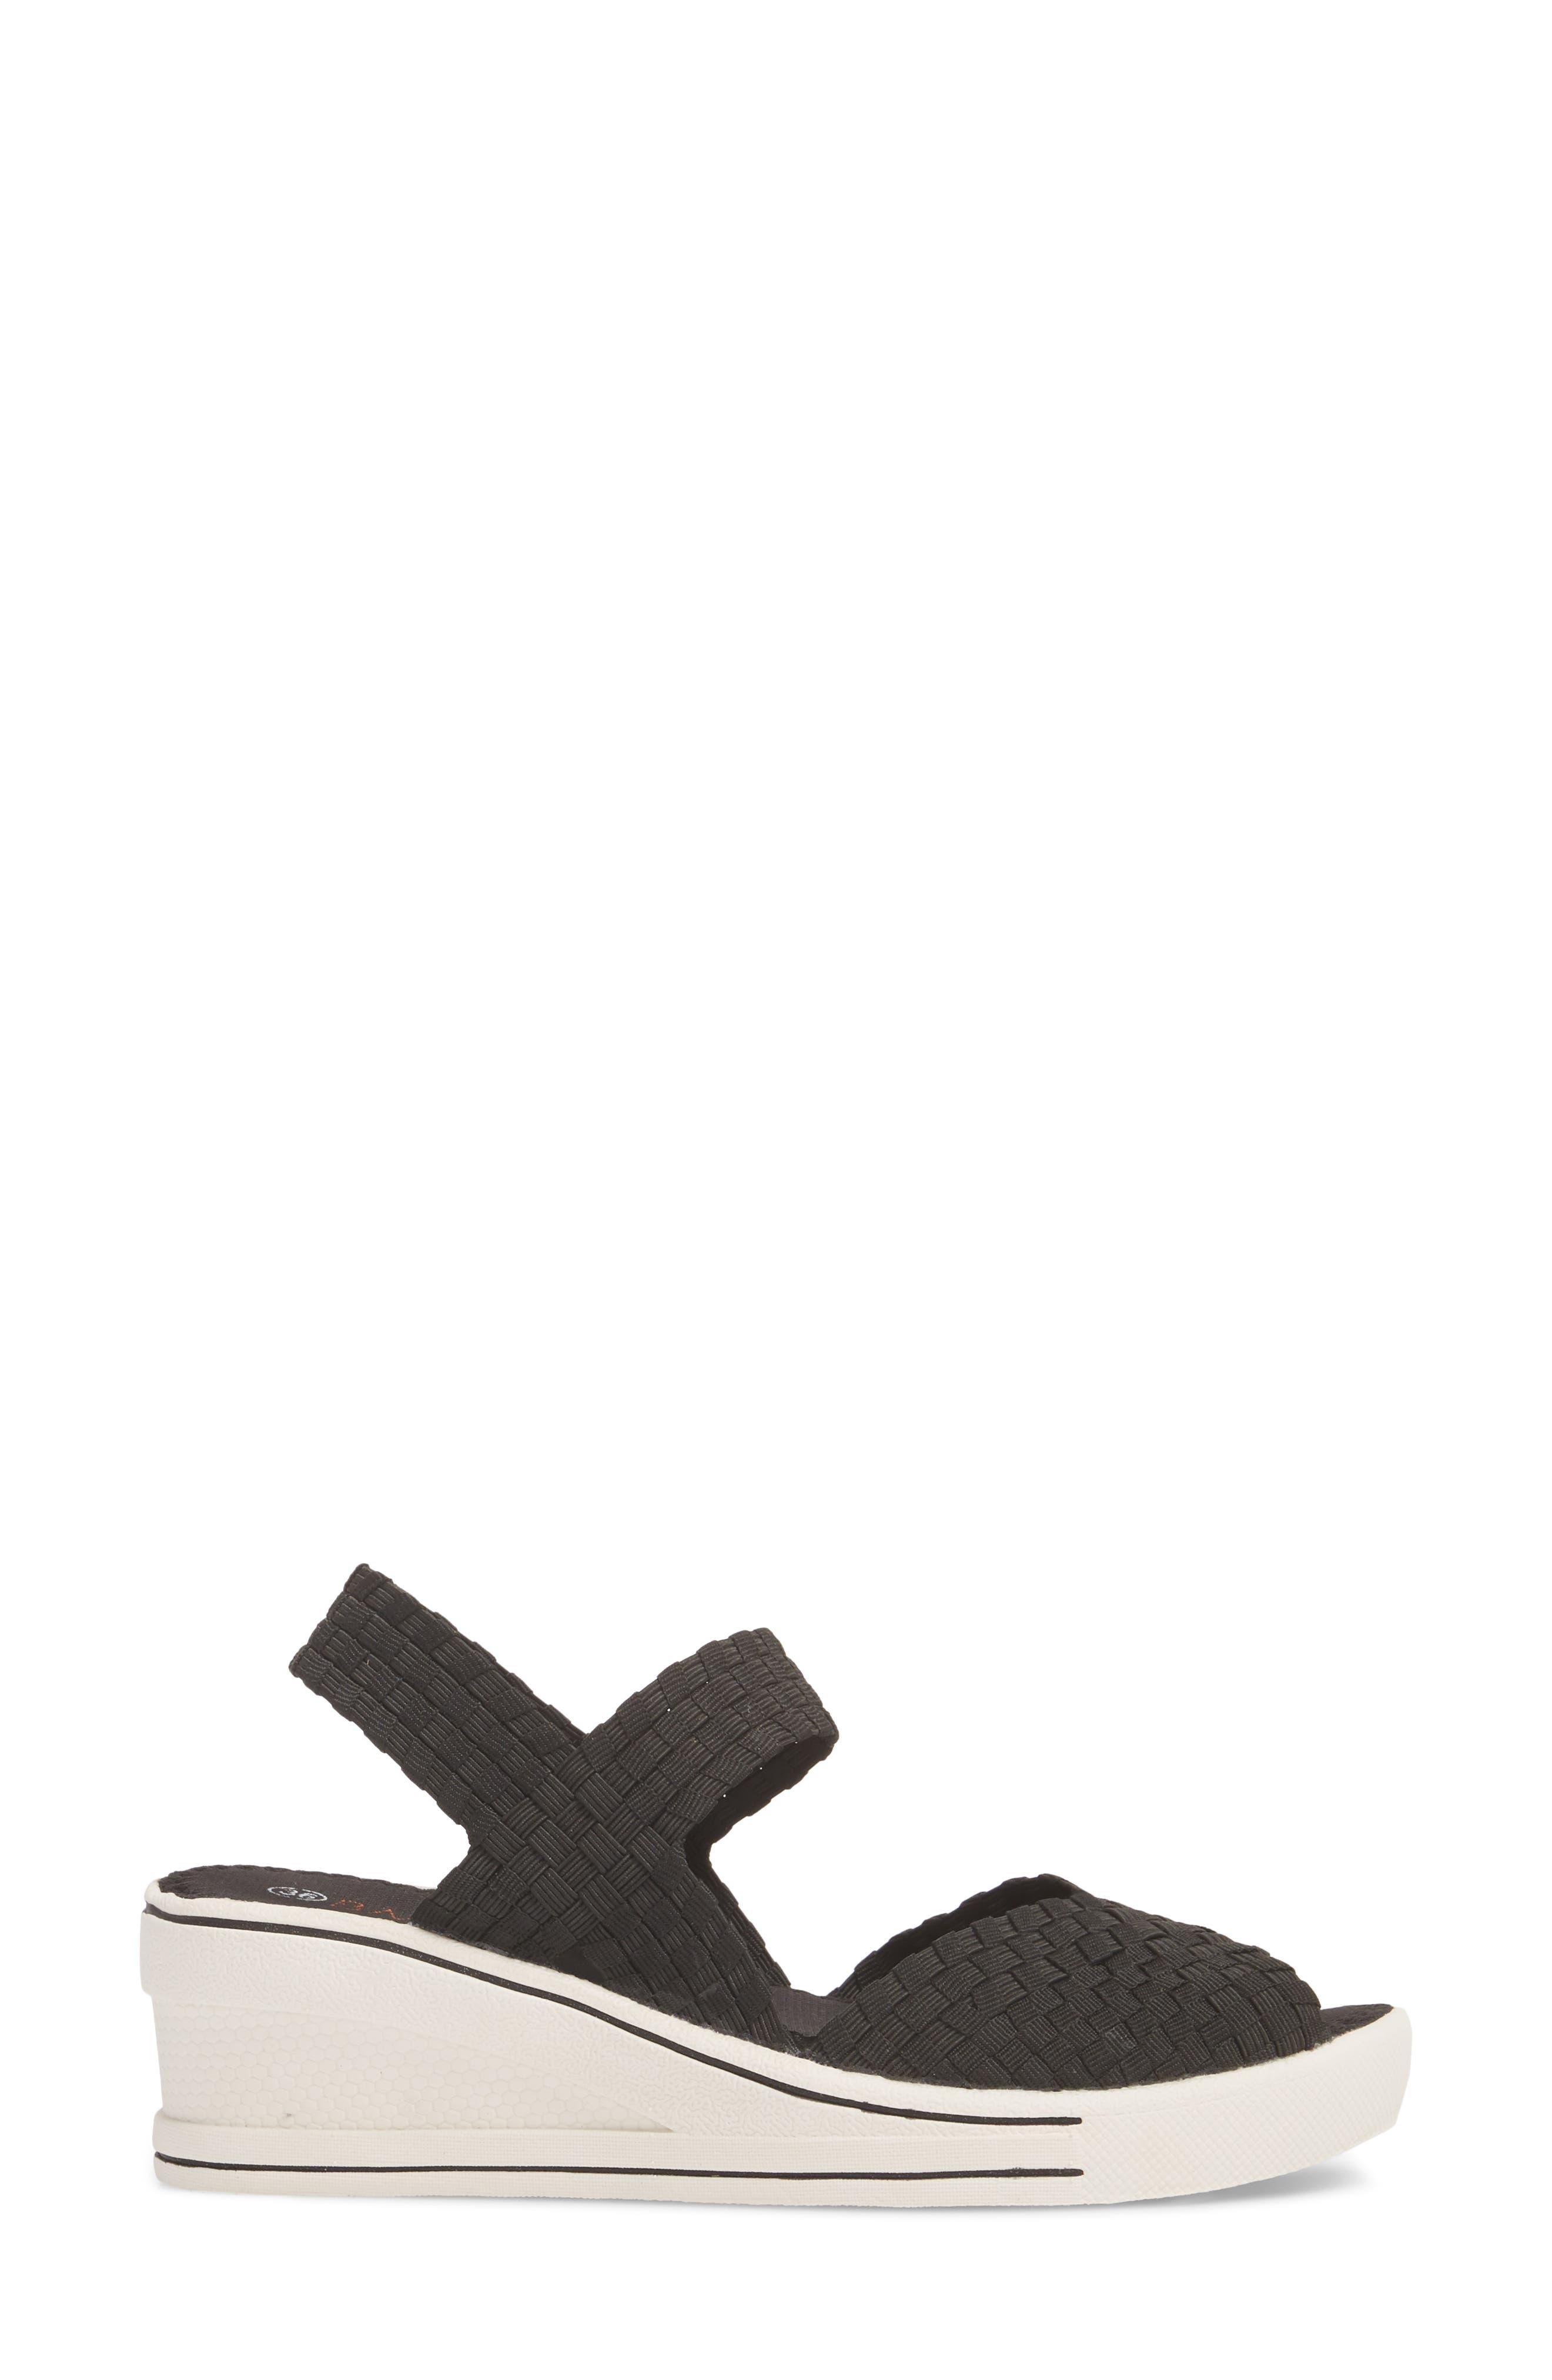 Lux Garden Sandal,                             Alternate thumbnail 3, color,                             BLACK FABRIC